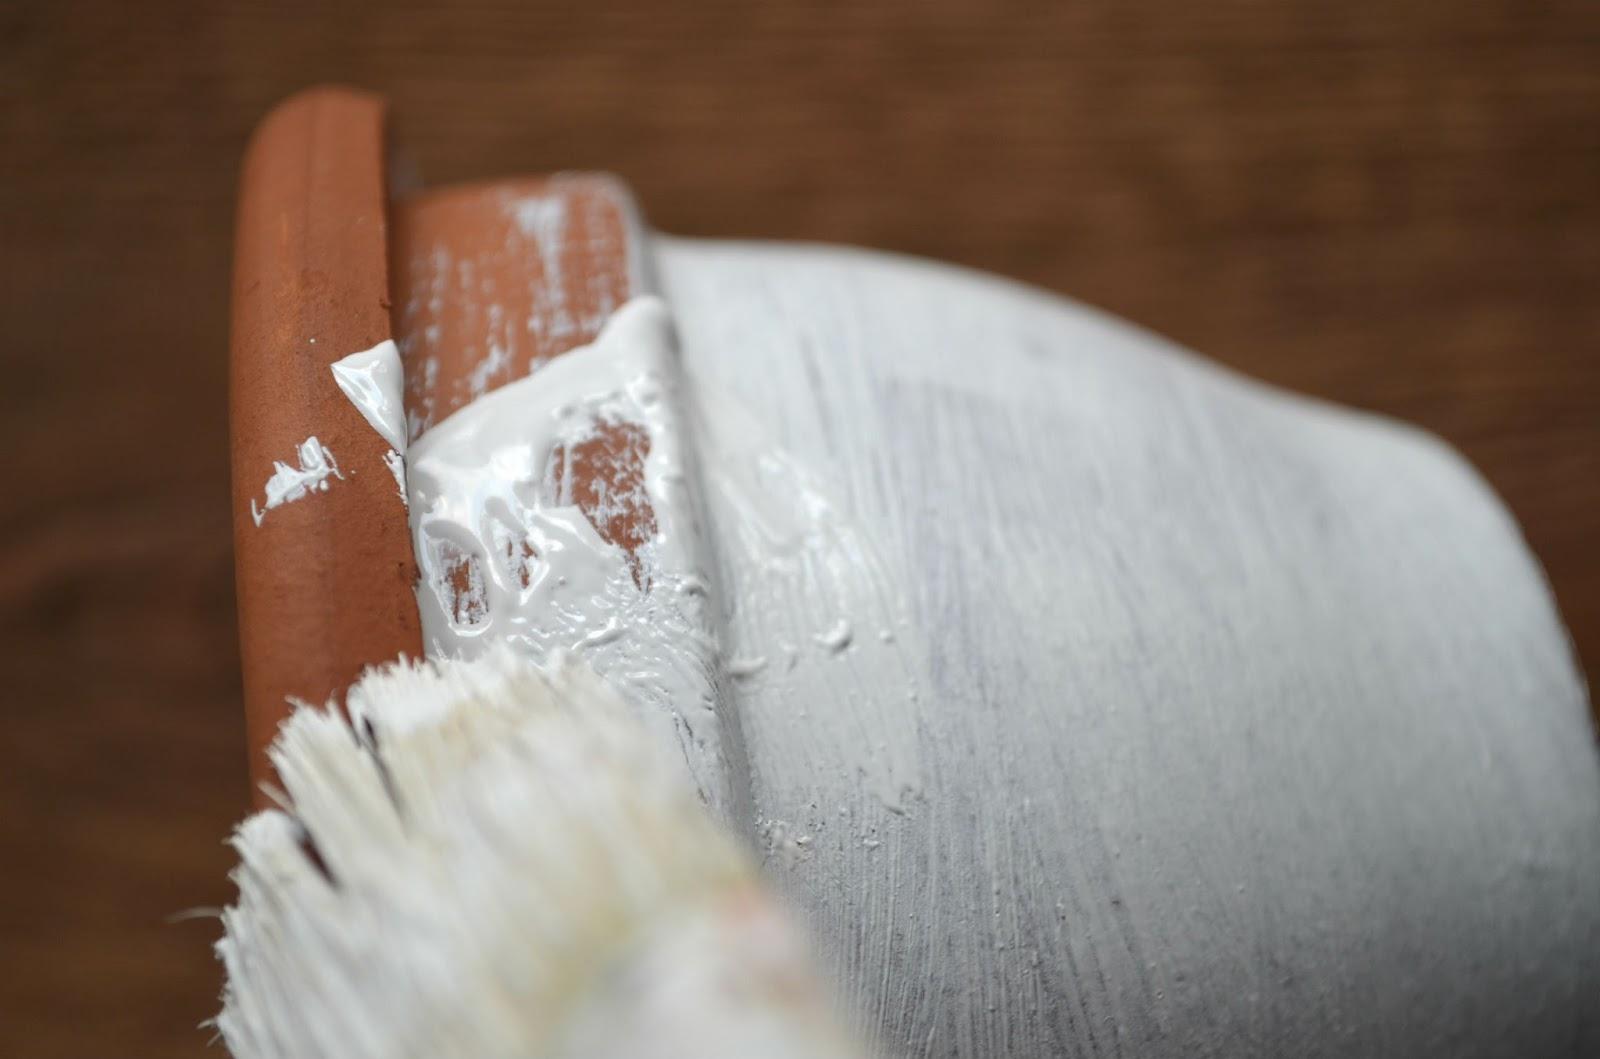 Woodcrafts Kreatywne Malowanie Eggshell Versante